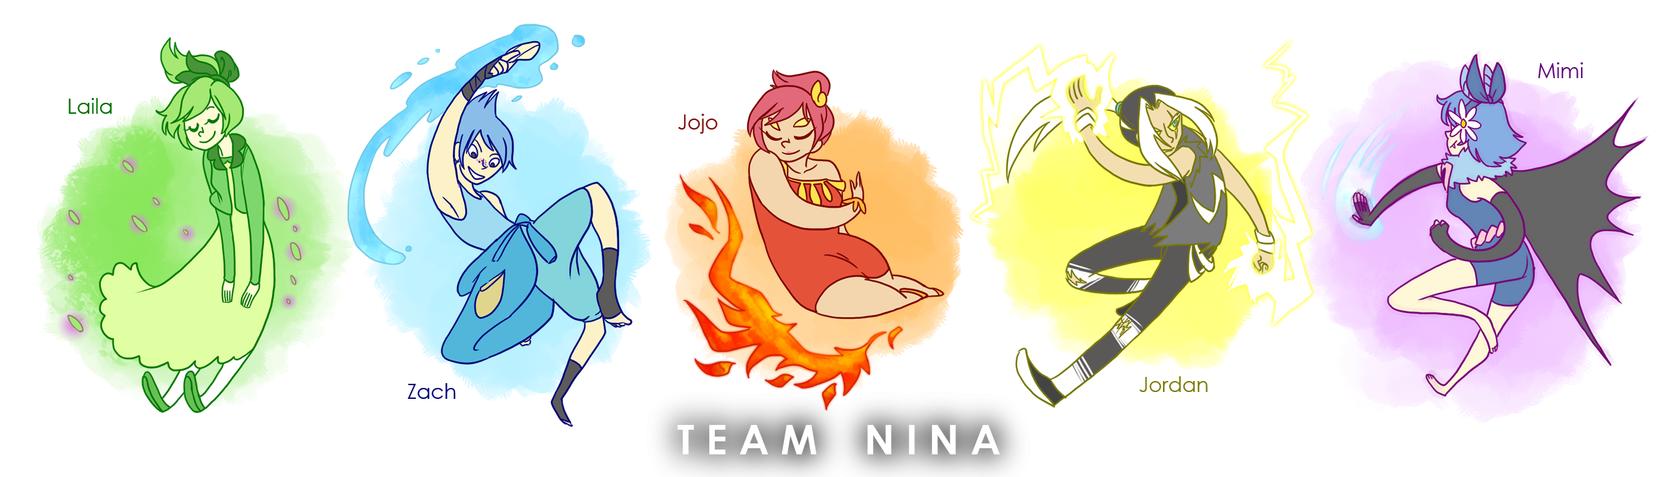 White Nuzlocke: Team Picture 1 by ky-nim